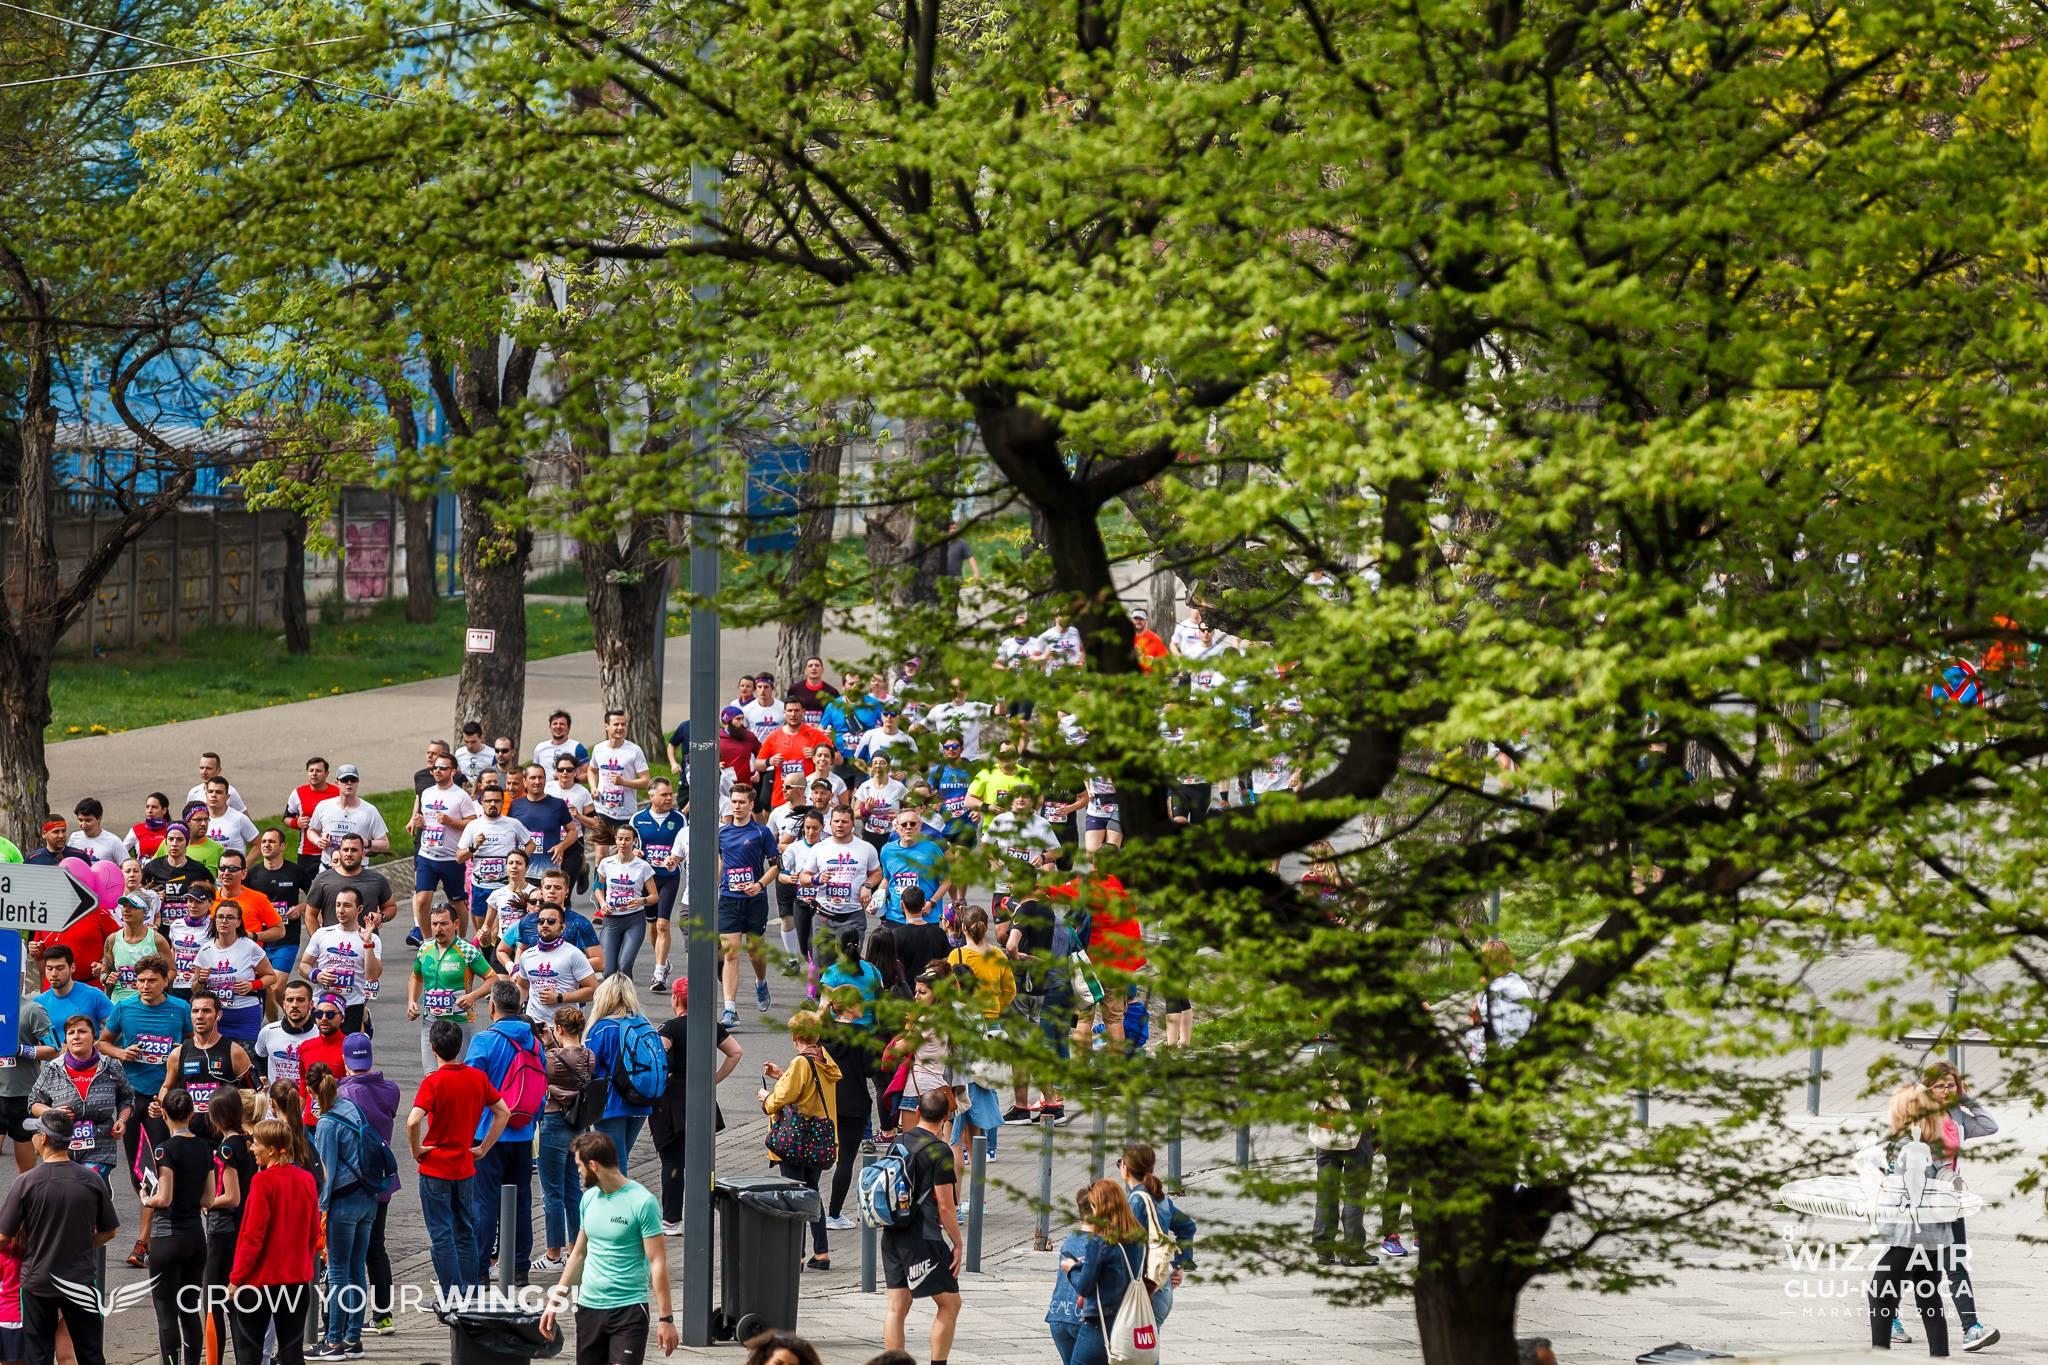 Maratonul Internațional Cluj-Napoca photo 1